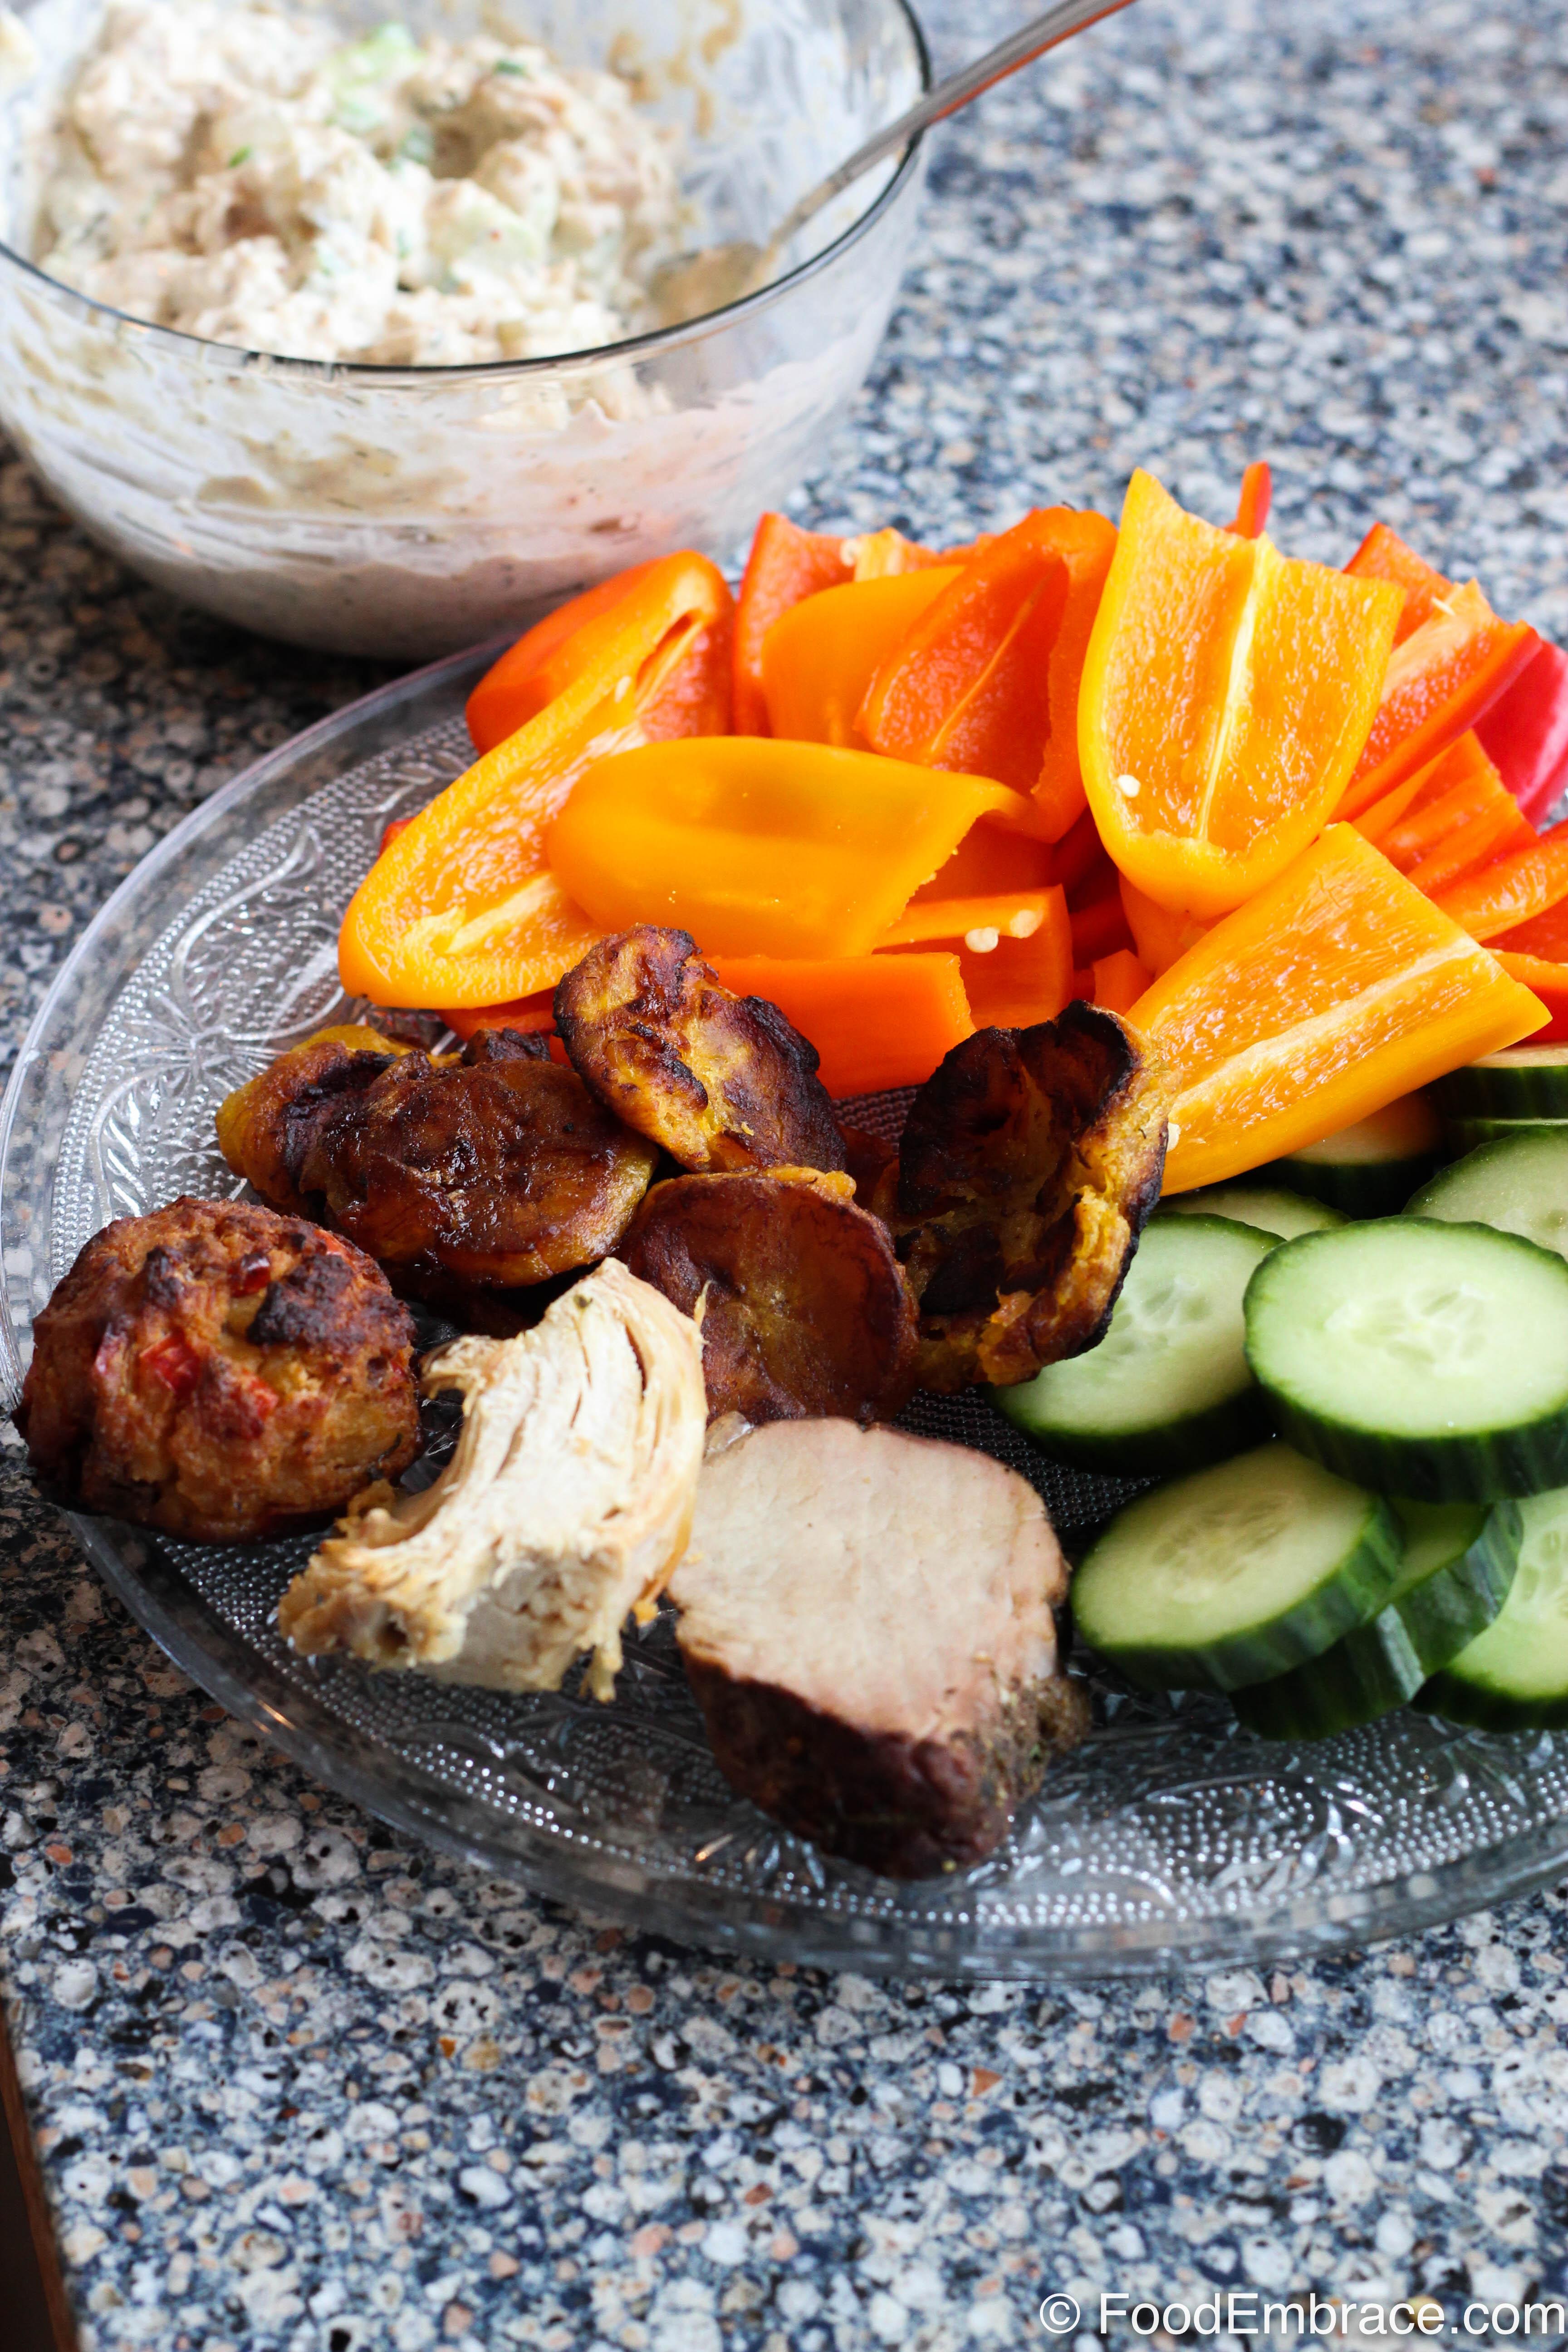 Tuna salad, random snack plate